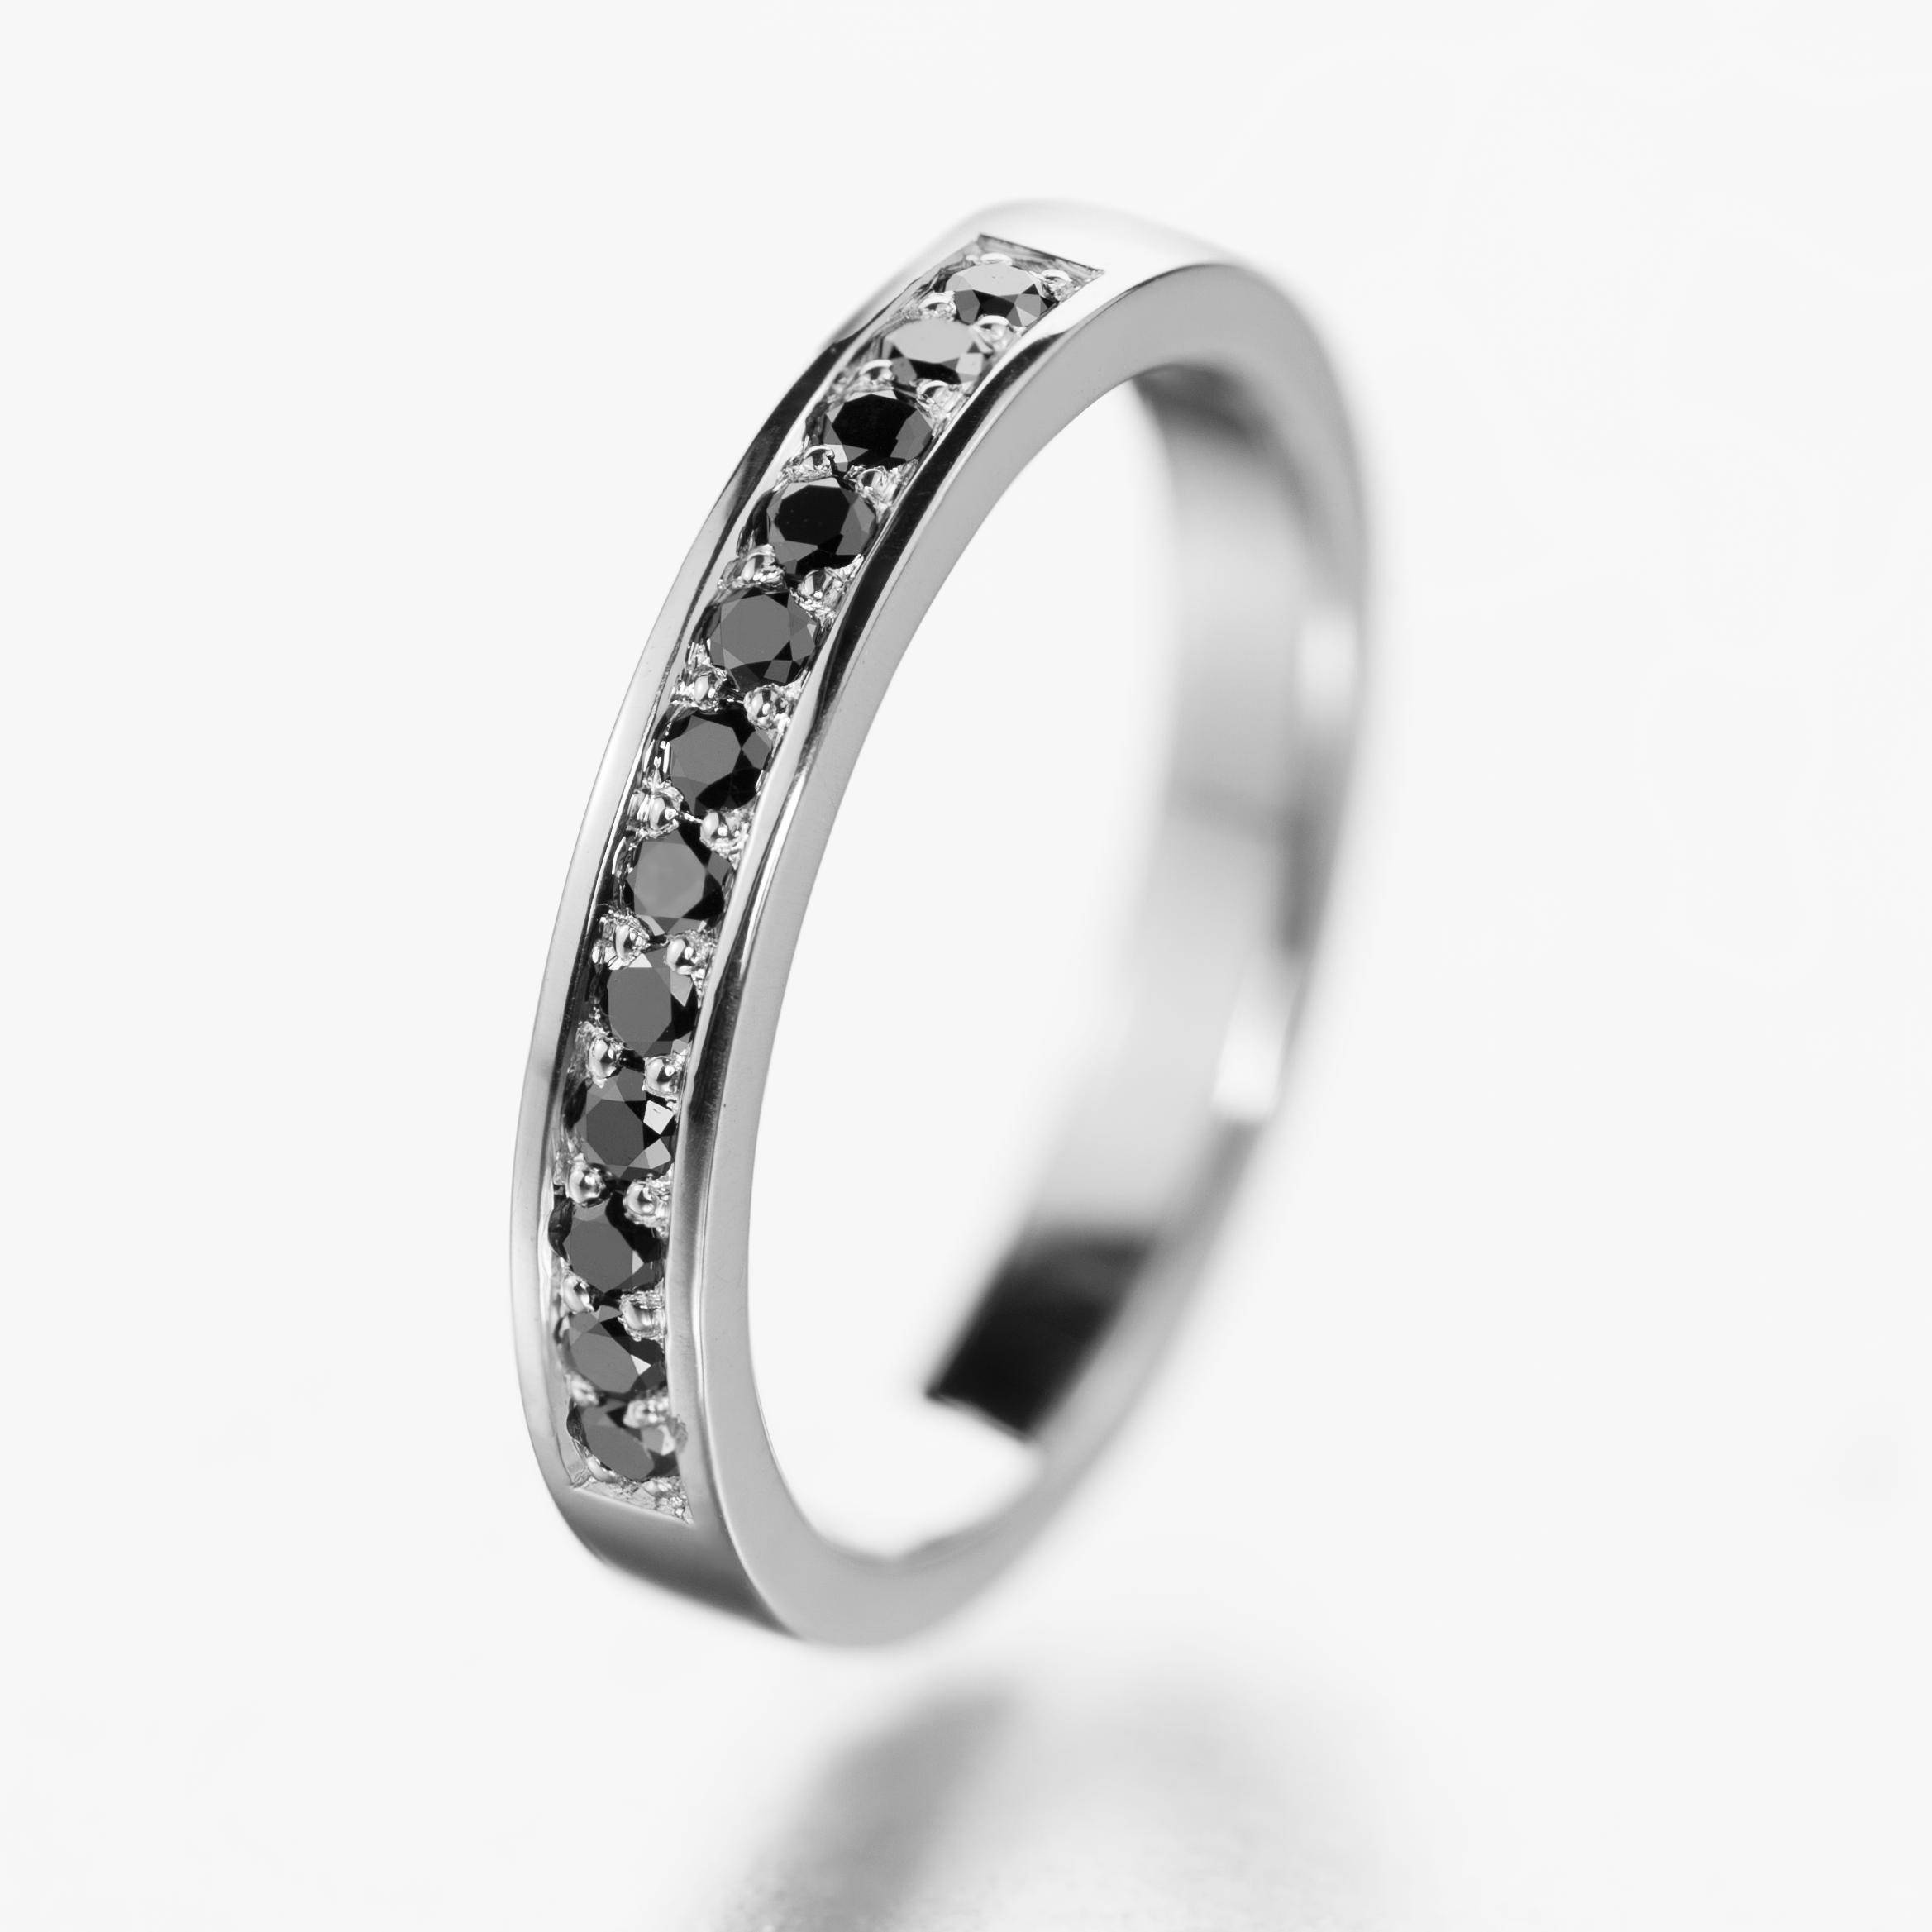 Half eternity ring with black diamonds.